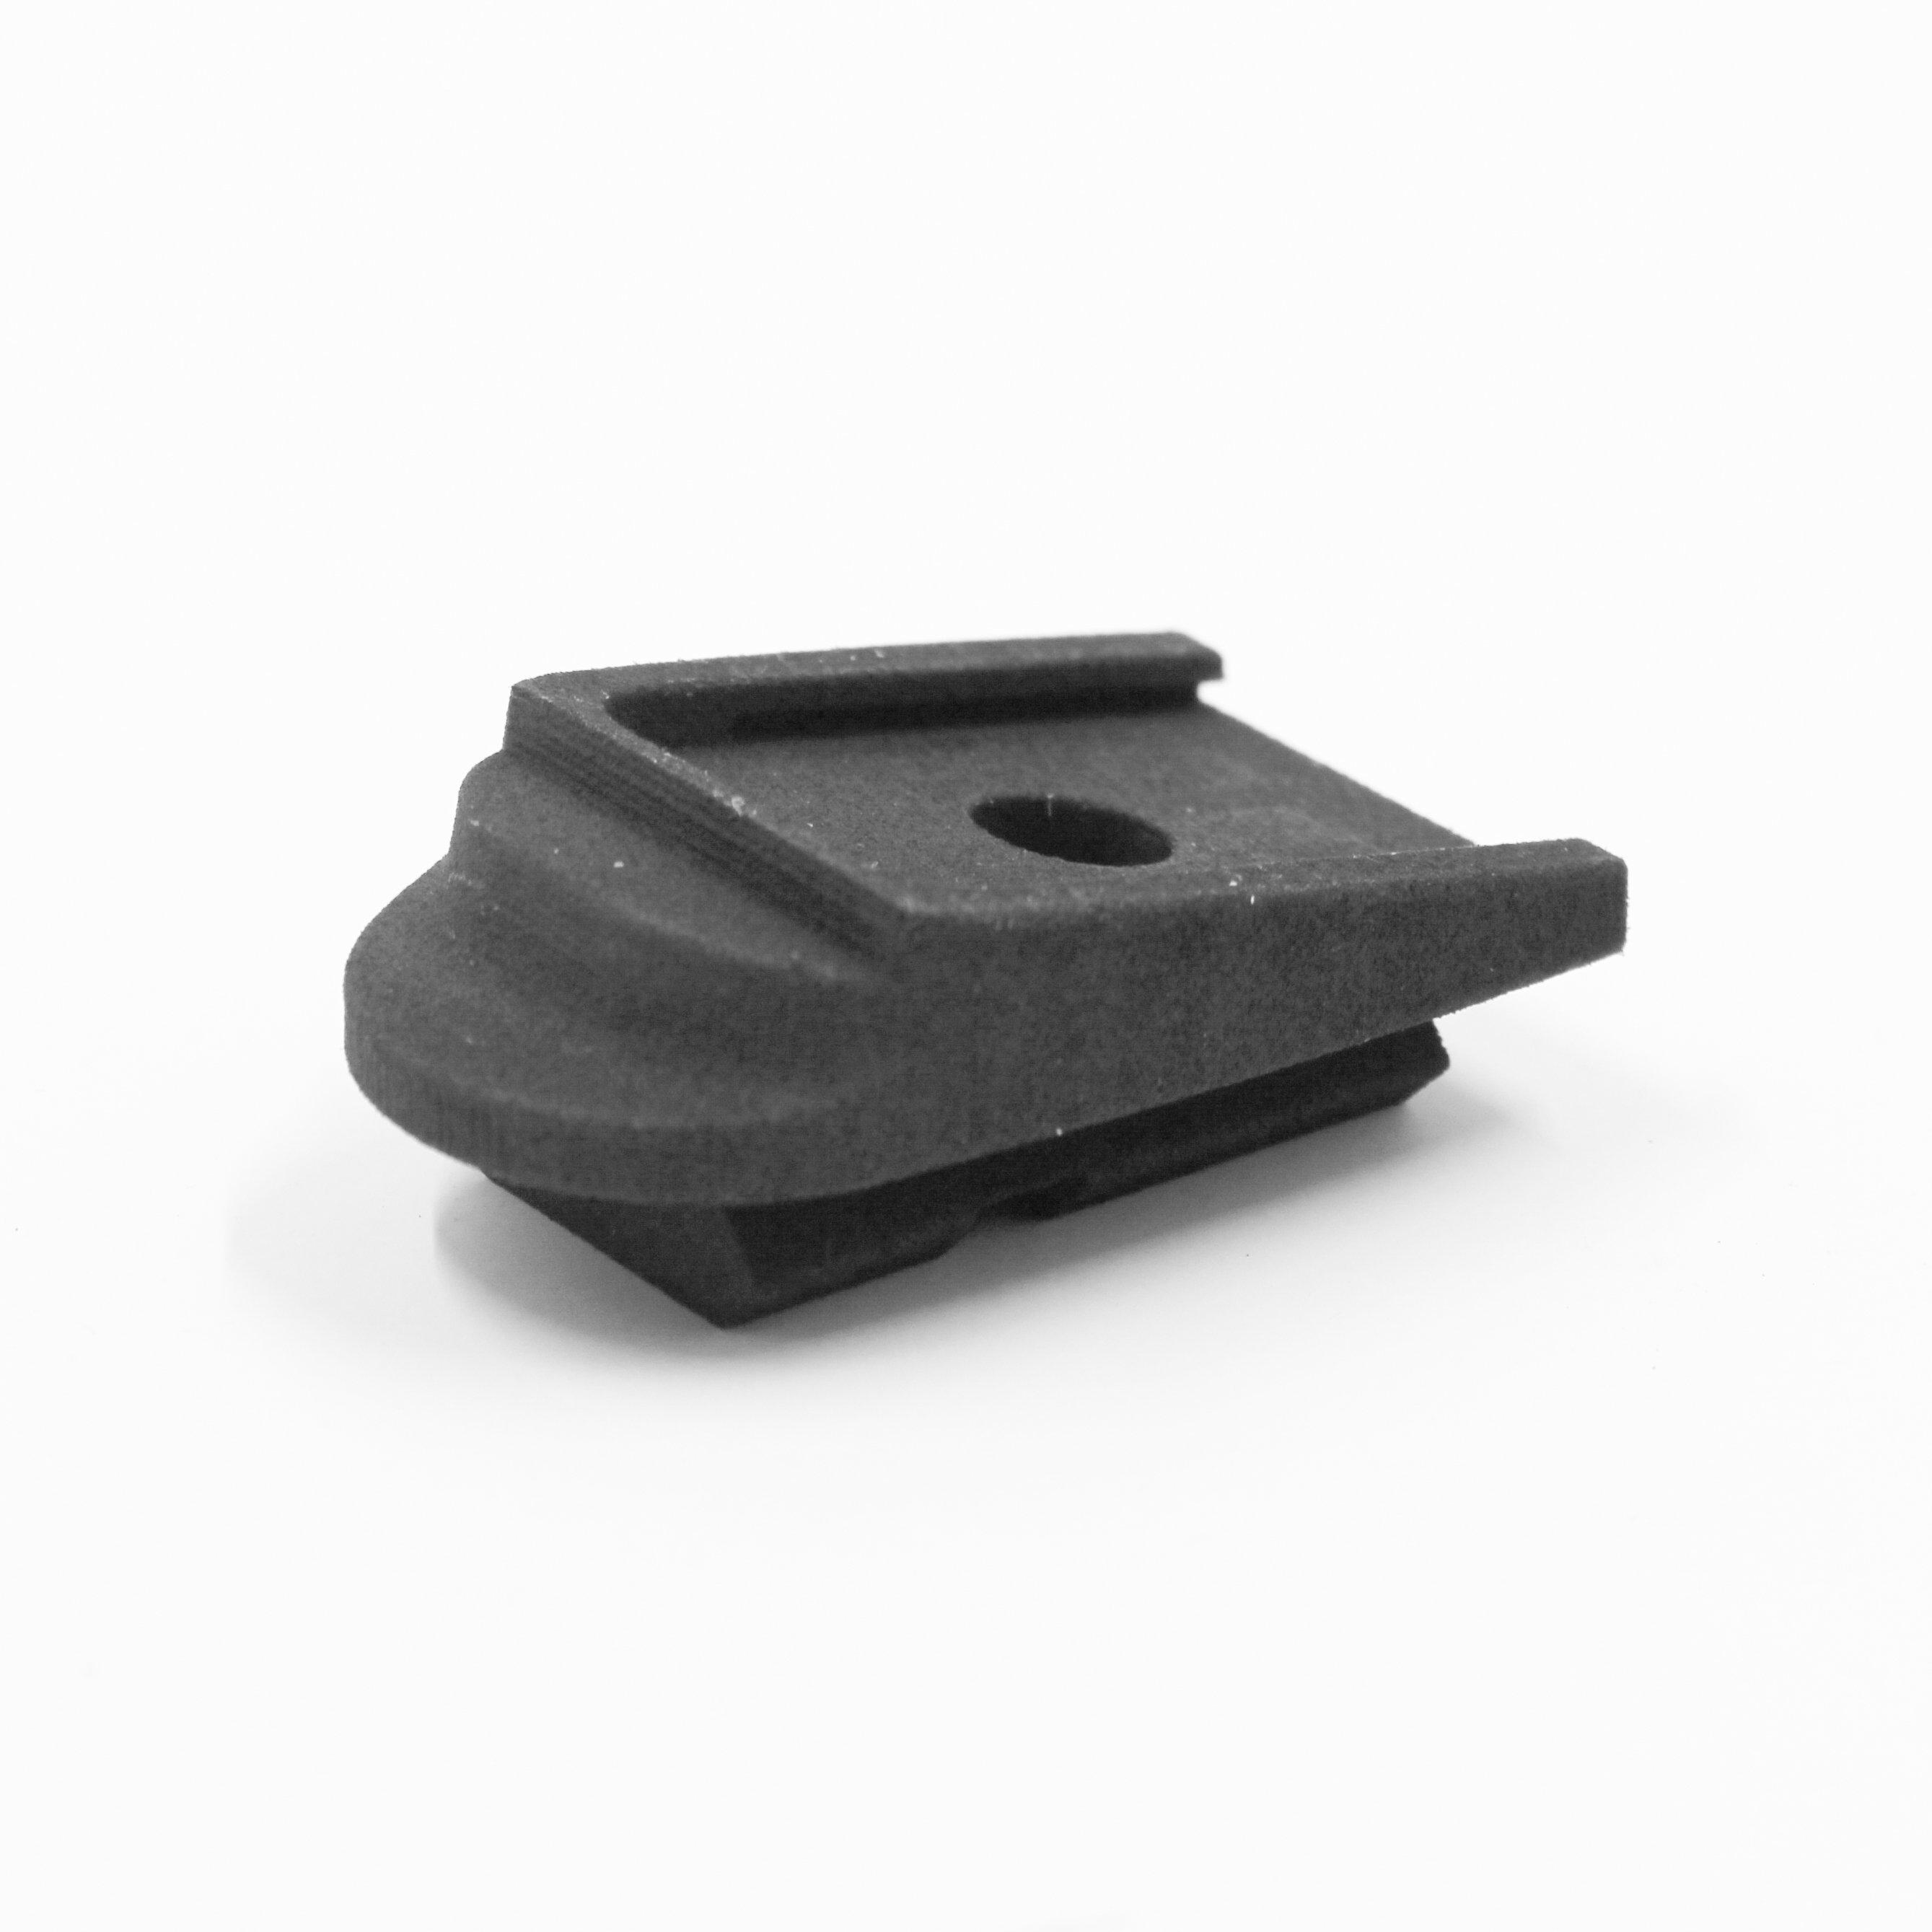 MAGRAIL - MAGAZIN BODENPLATTE HK USP Compact 9mm